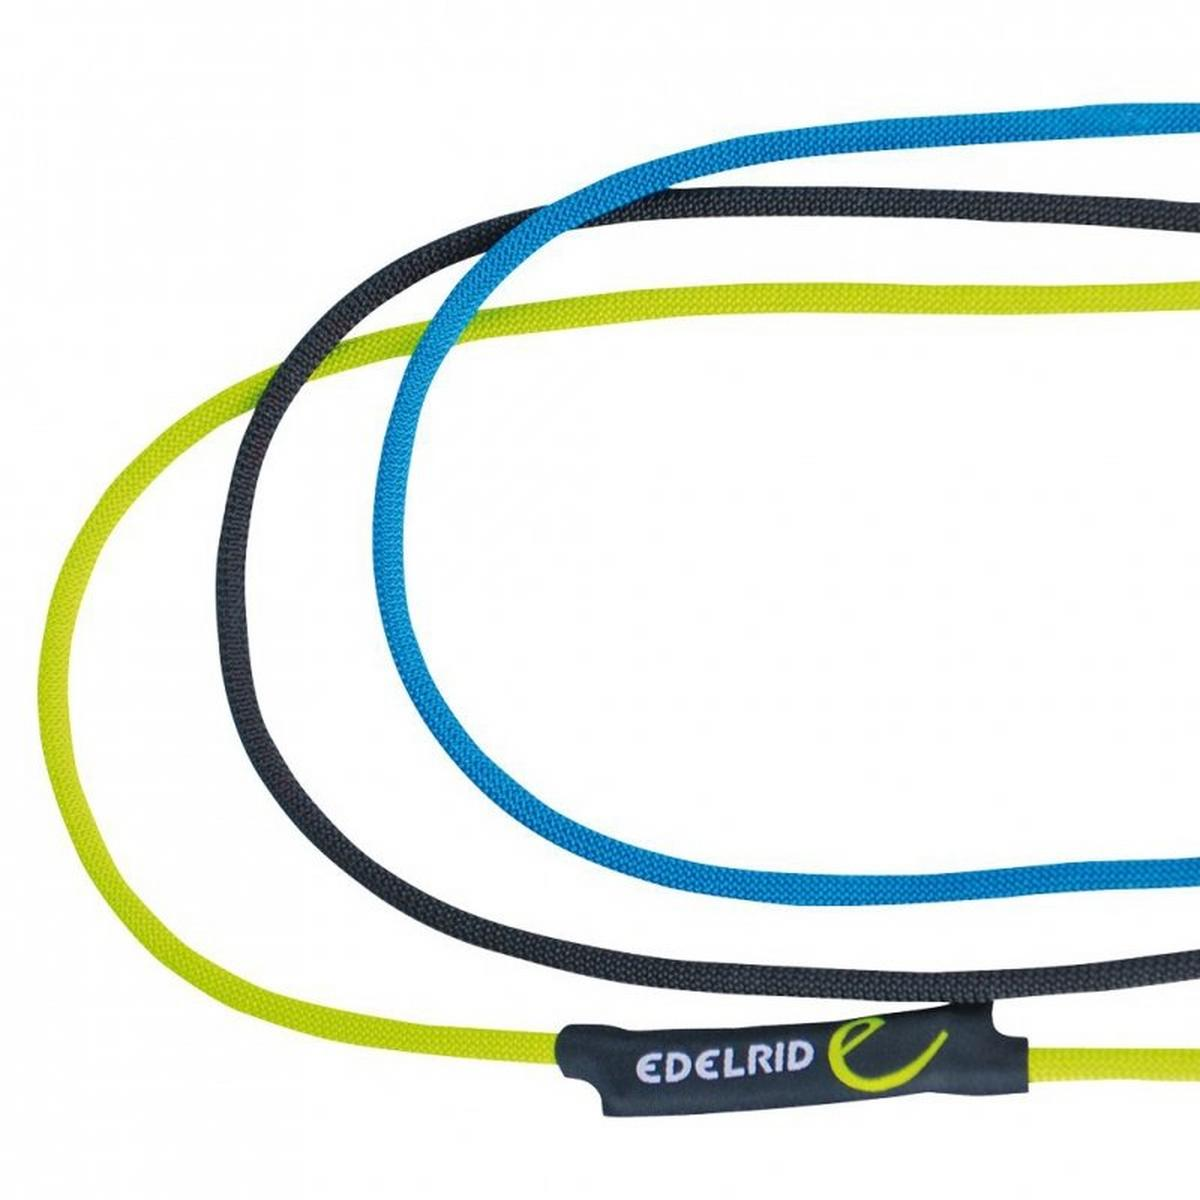 Edelrid Sling Aramid Cord 6 mm x 60 cm Oasis